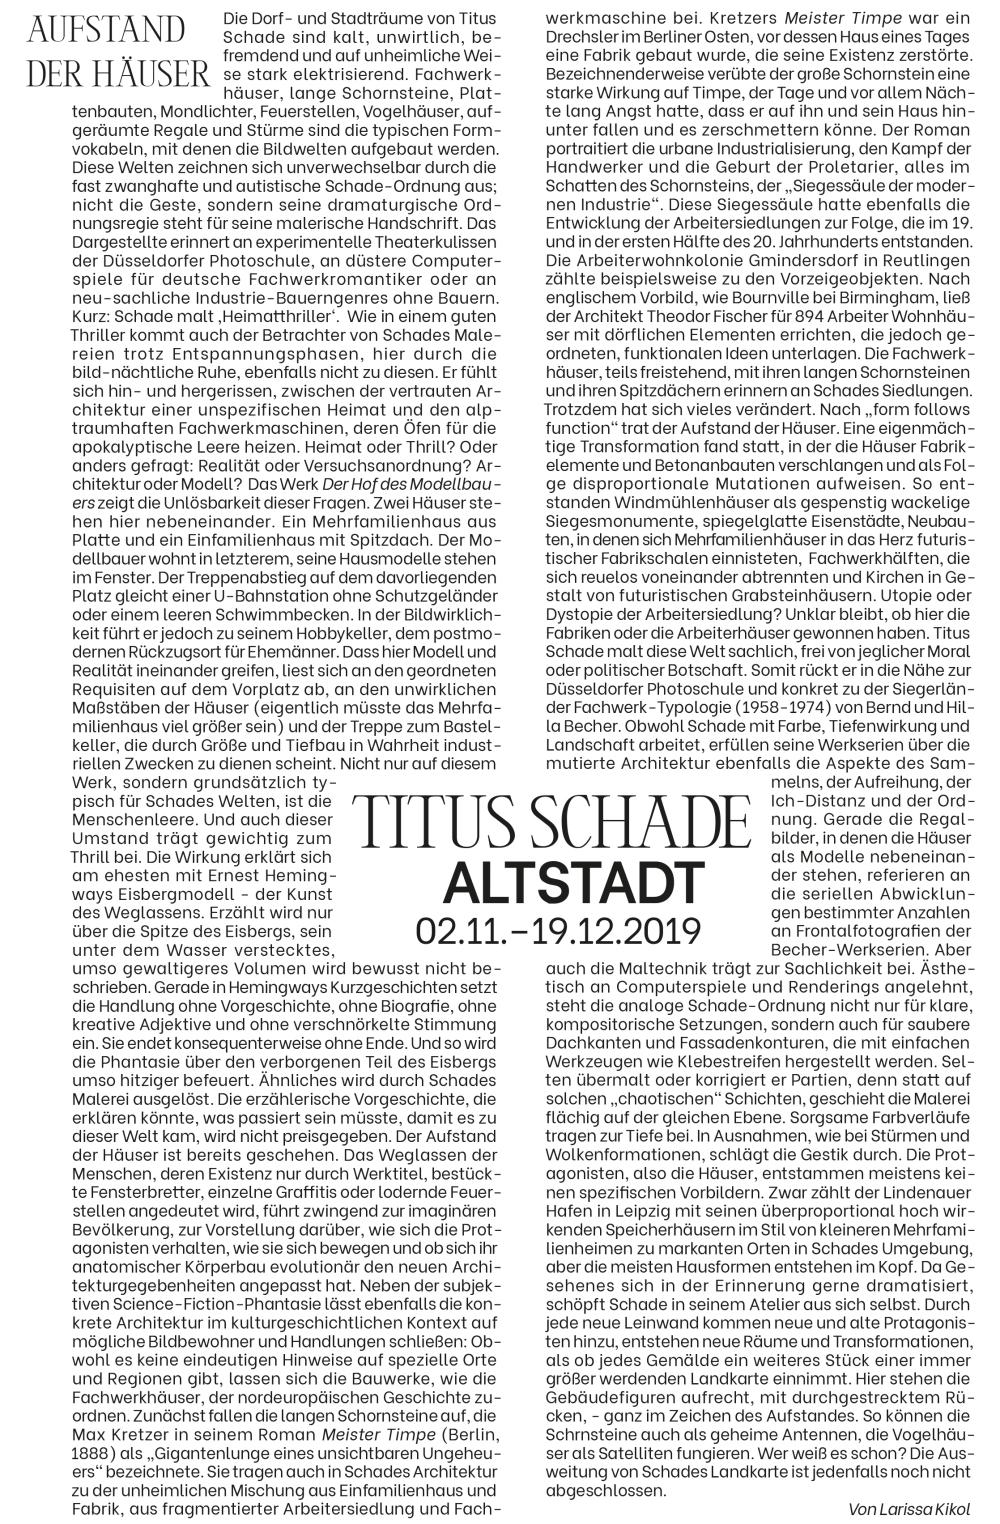 Eigen + Art_Titus Schade.indd